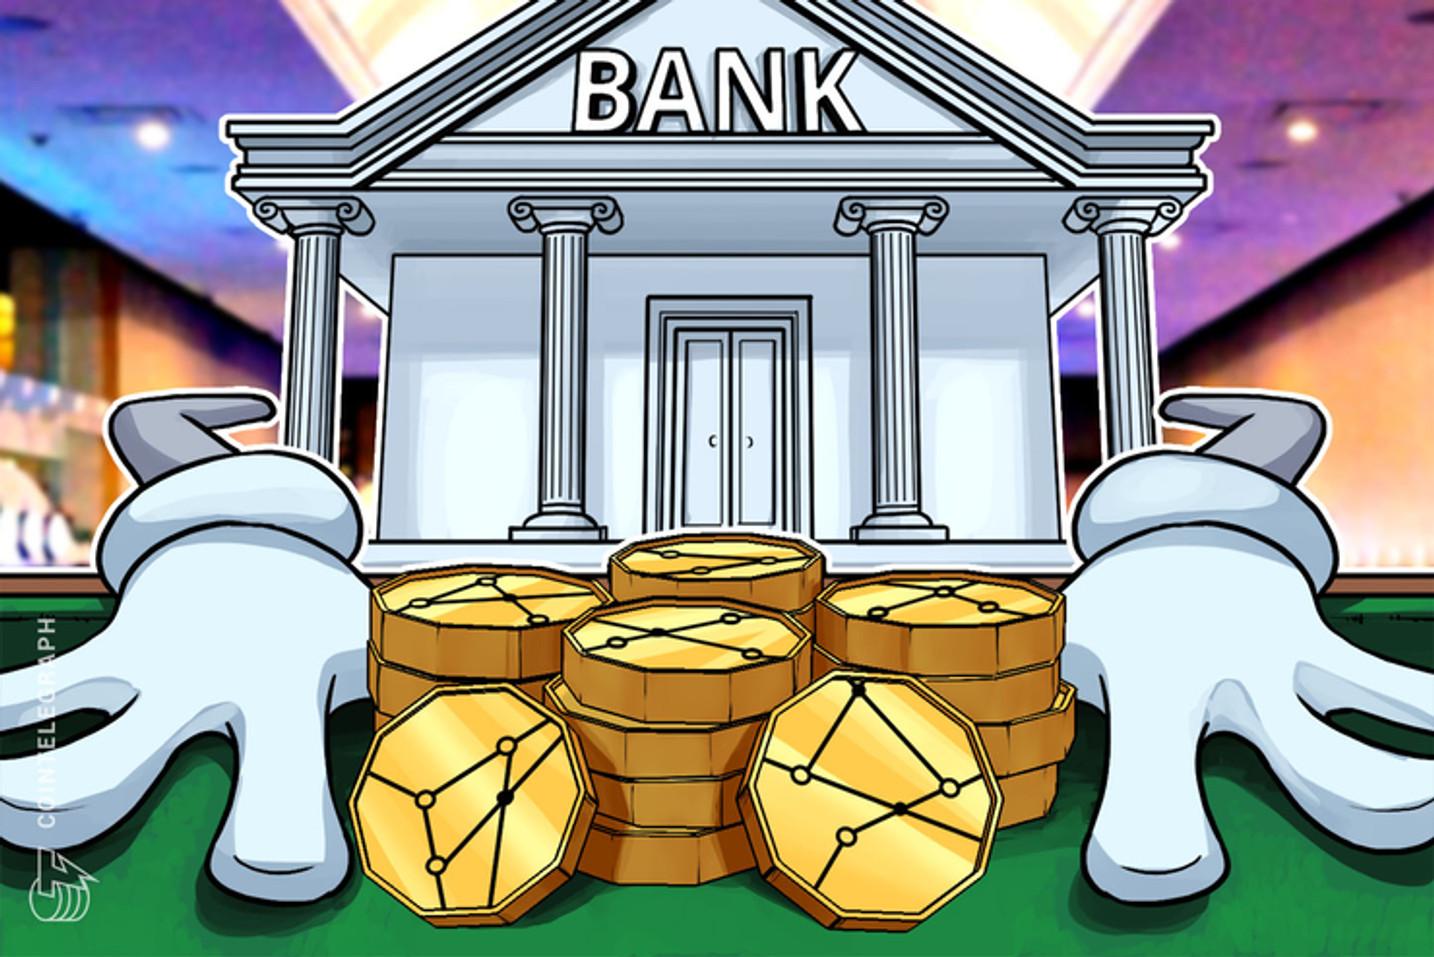 Bundesregierung: Notenbanken sollten digitales Zentralbankgeld und Stablecoins erforschen